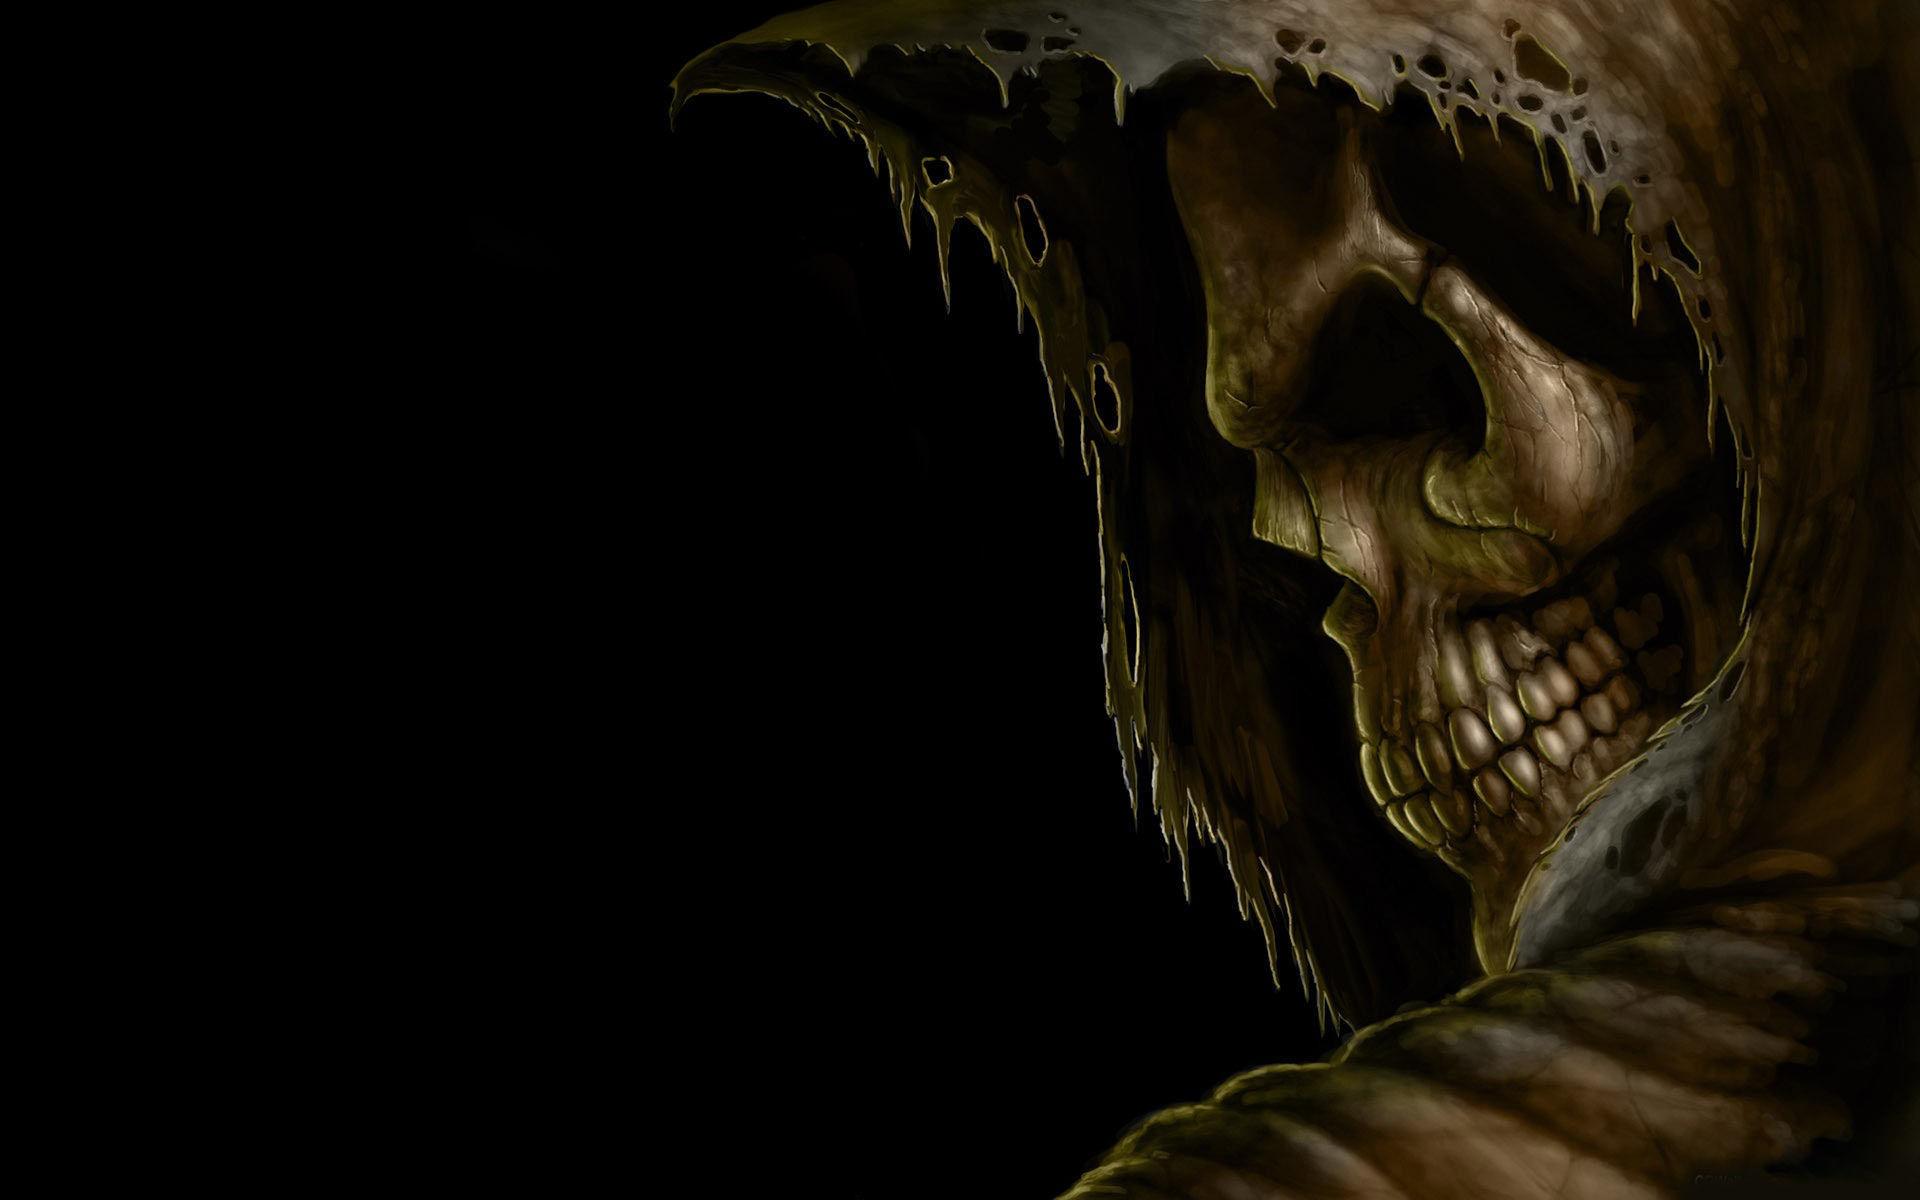 Uncategorized Scary Halloween Skulls grim reaper death dark skull hood eyes evil scary spooky creepy teeth black halloween wallpaper 1920x1200 25646 wallpaperup